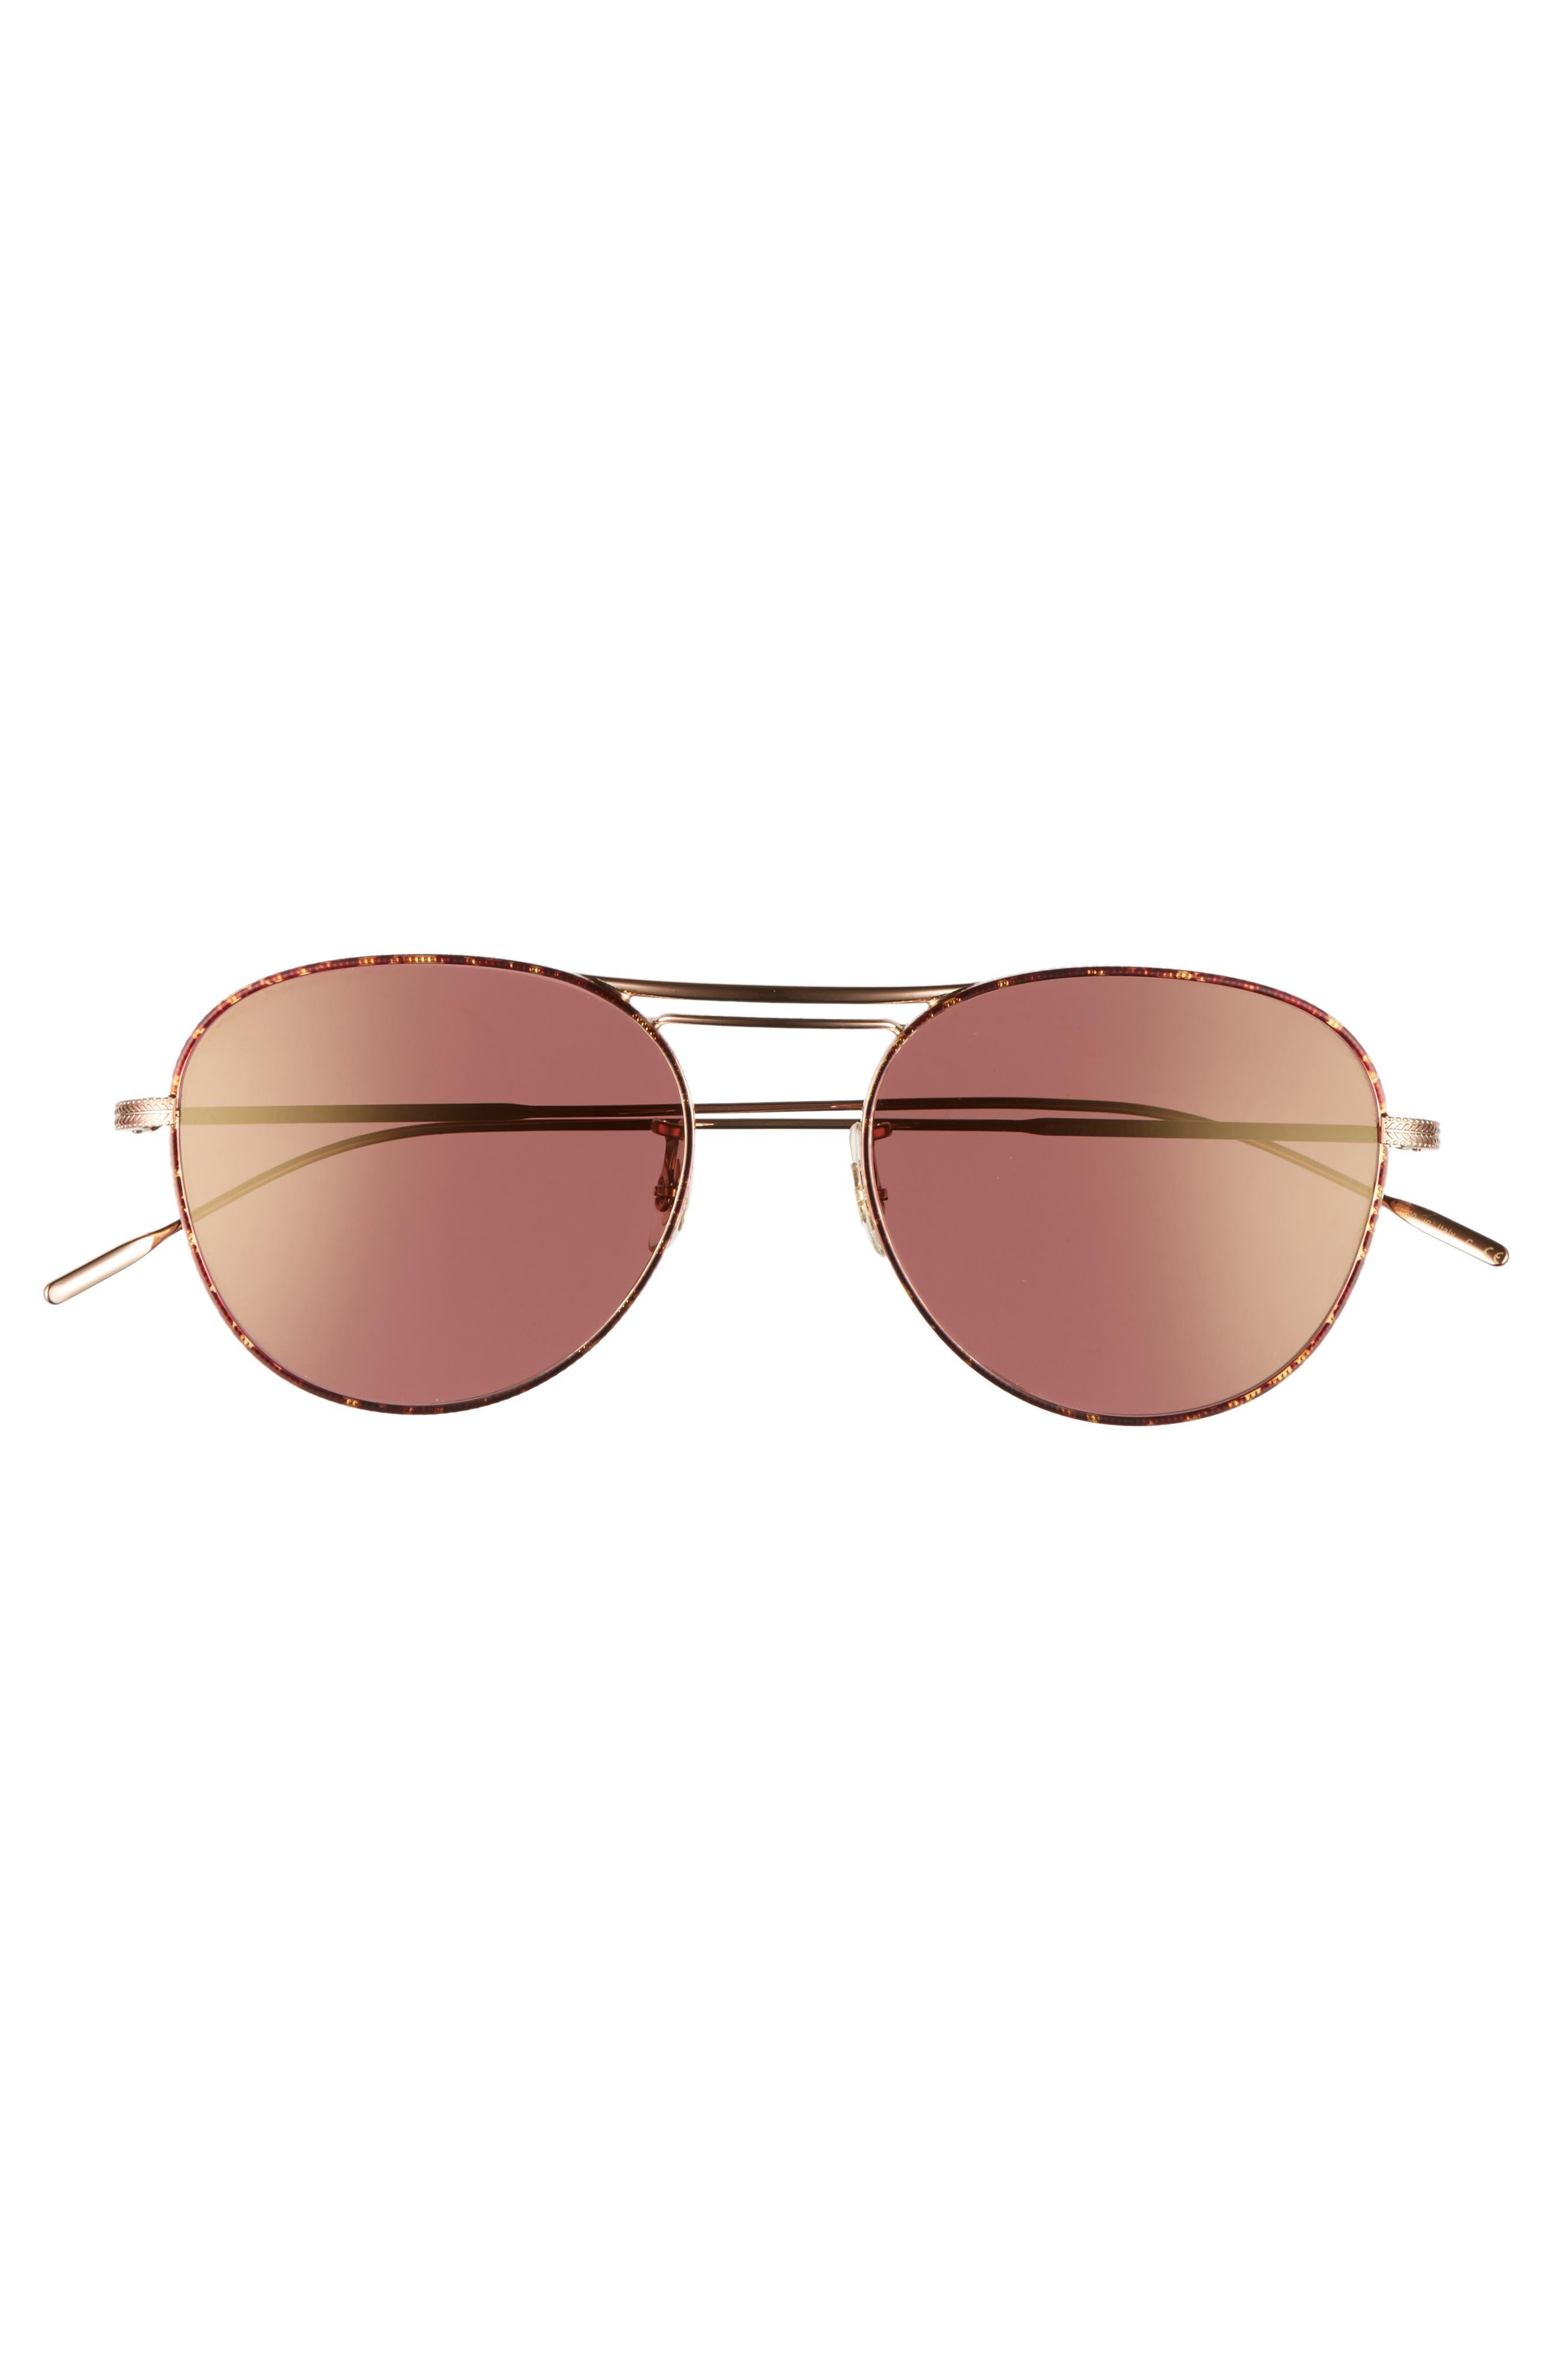 Cade 52mm Mirror Lens Aviator Sunglasses,                             Alternate thumbnail 2, color,                             Burgundy